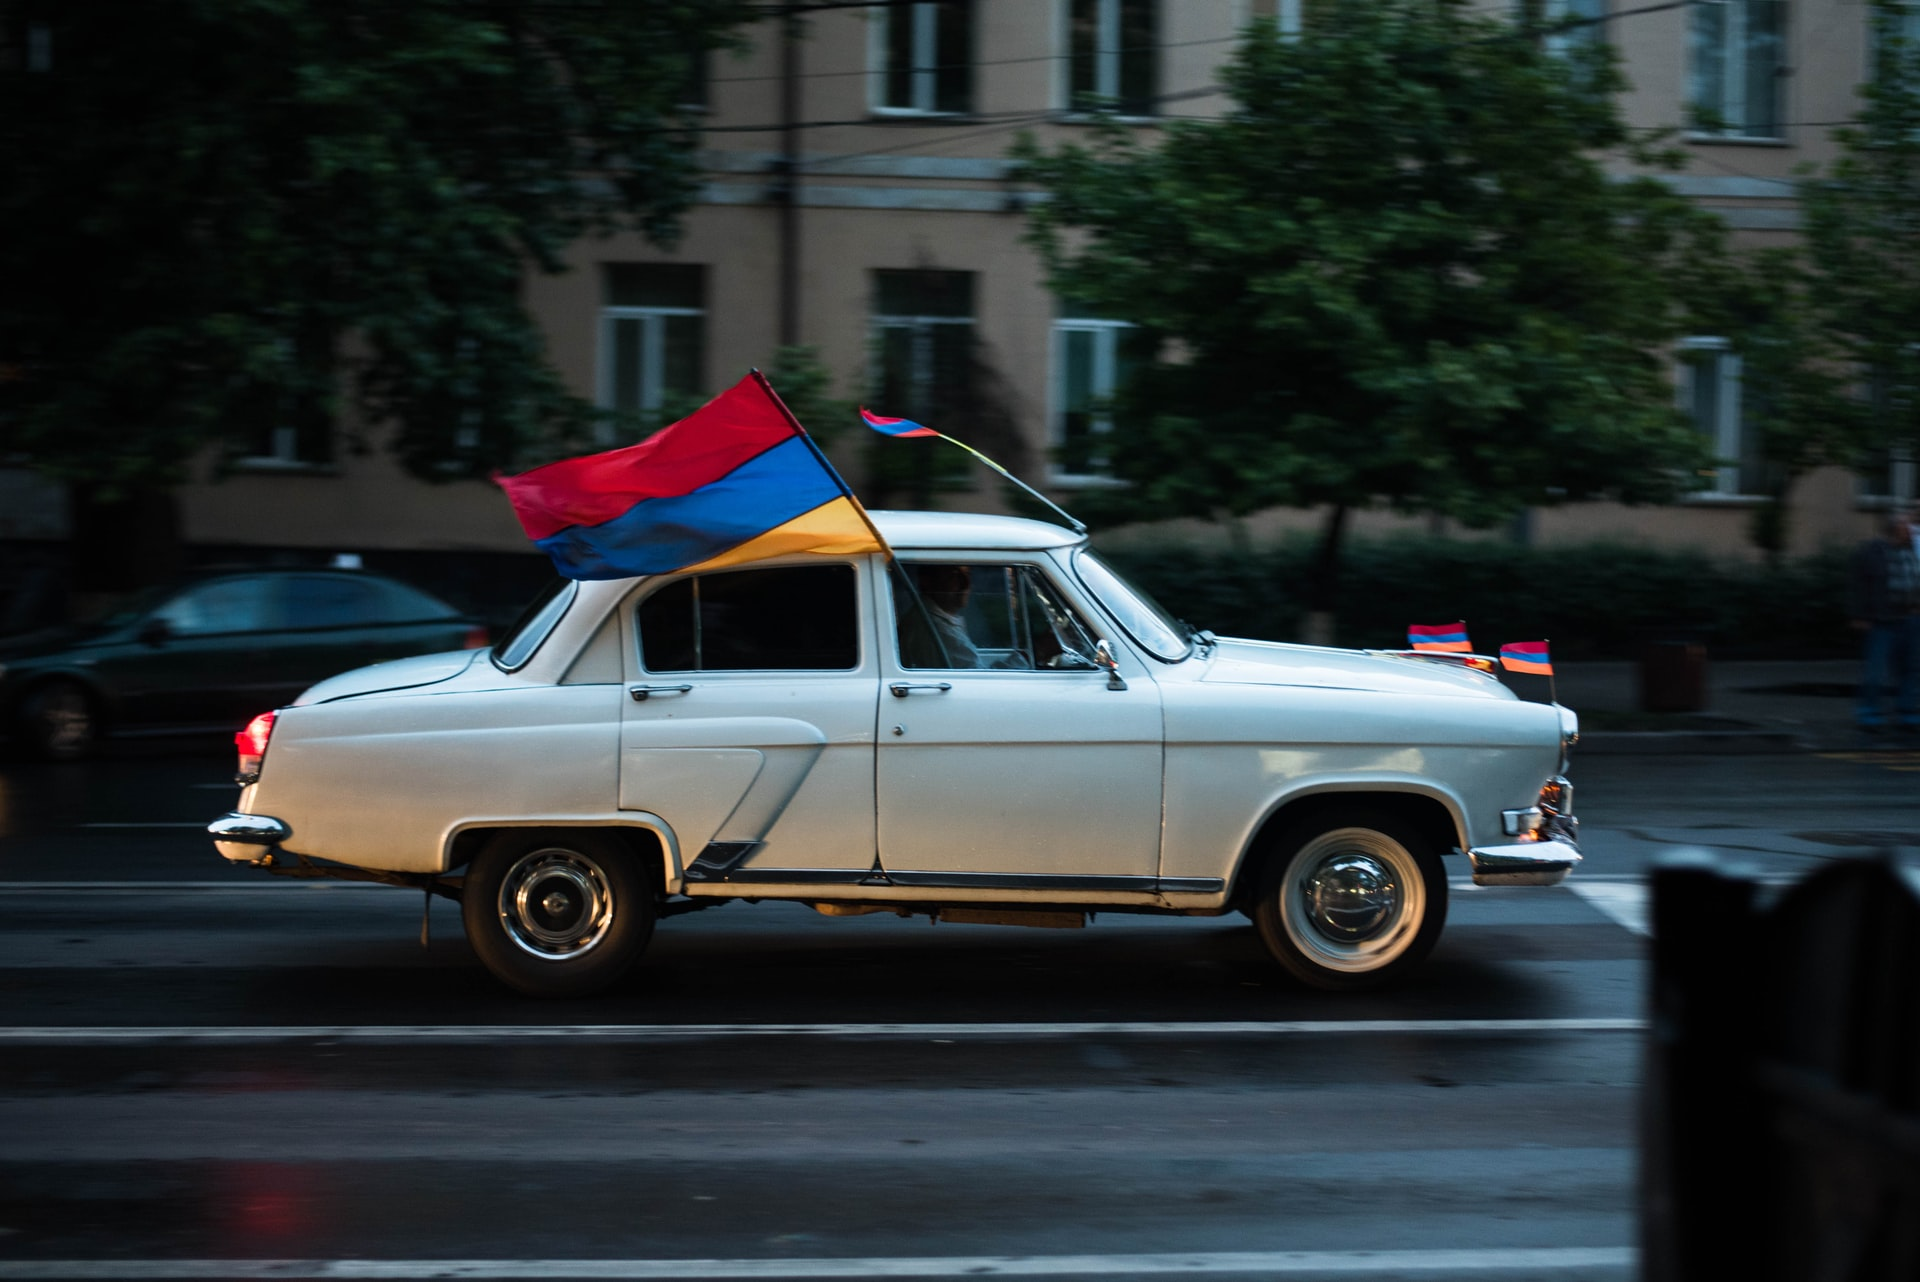 old car with armenian flags